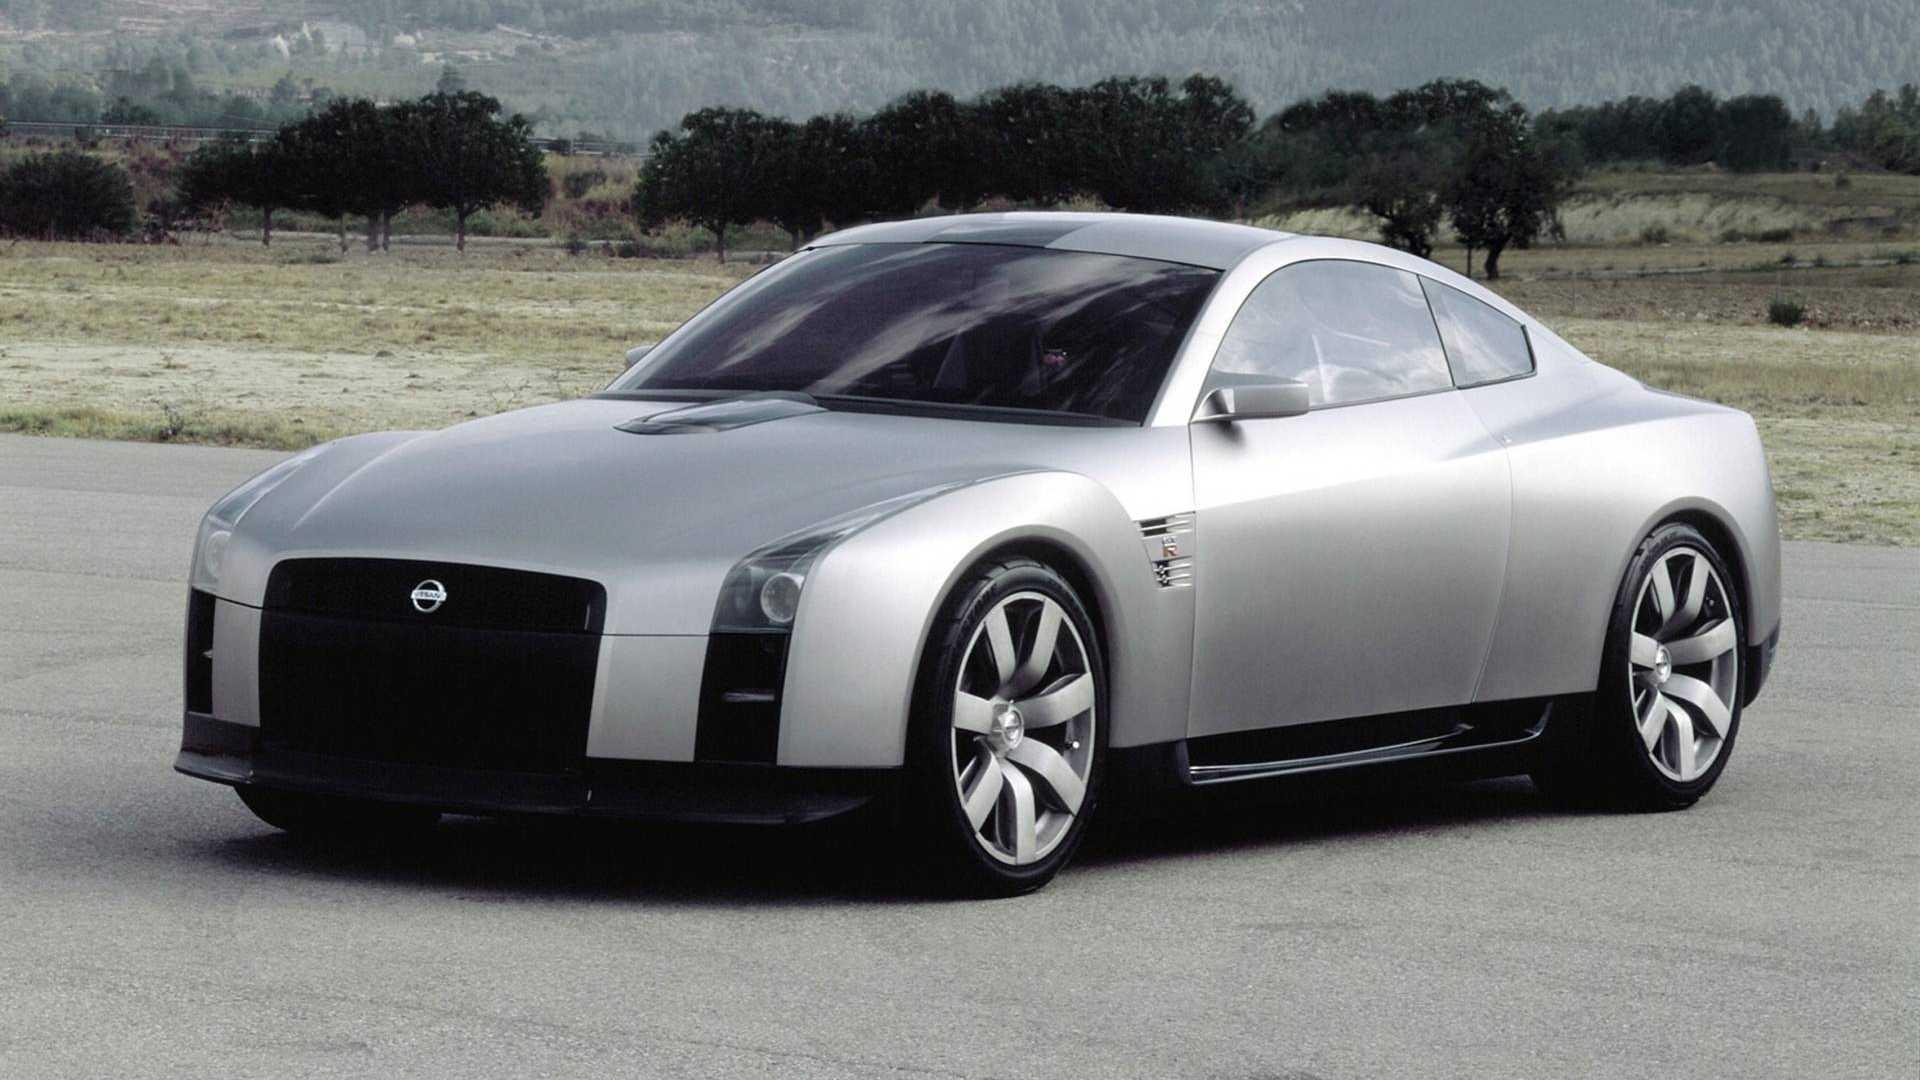 2001 Nissan GT-R: Concept We Forgot